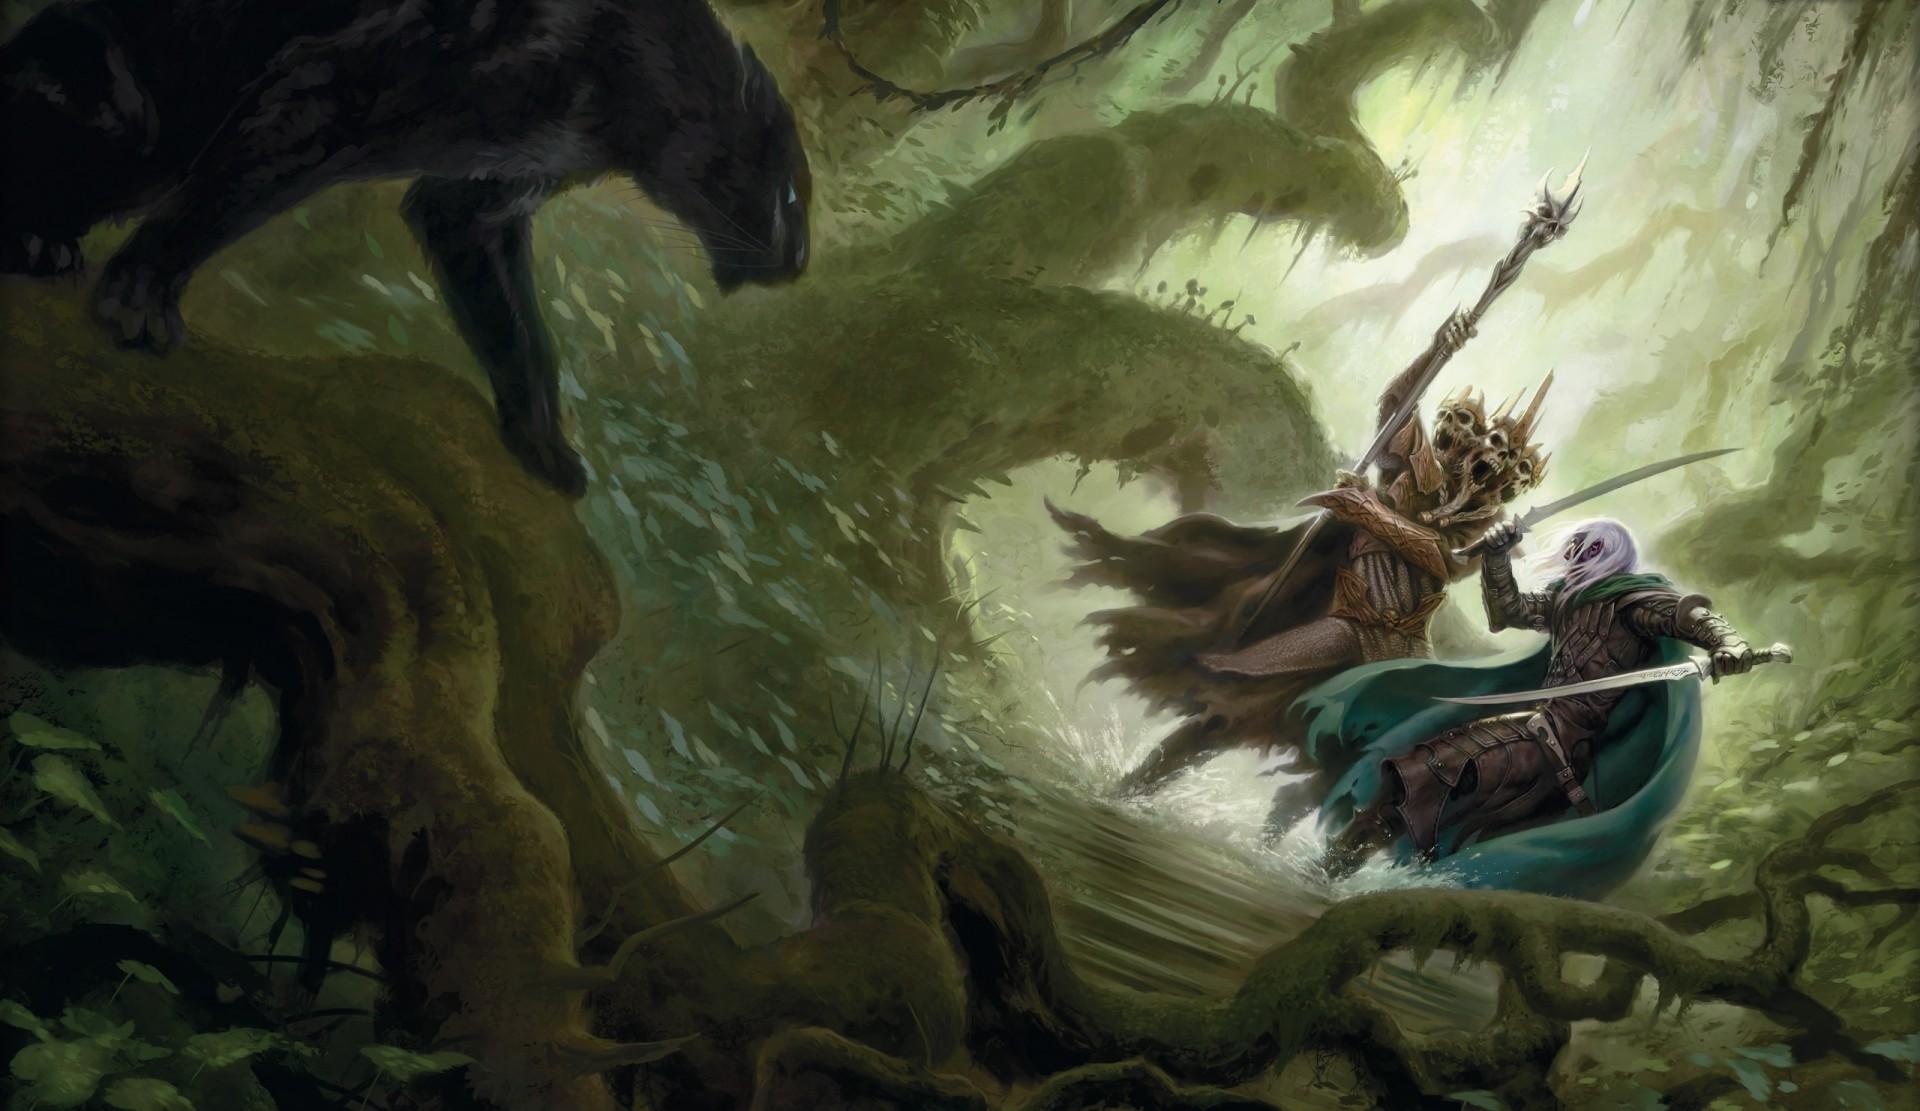 Forgotten realms dark elf girl adult clips